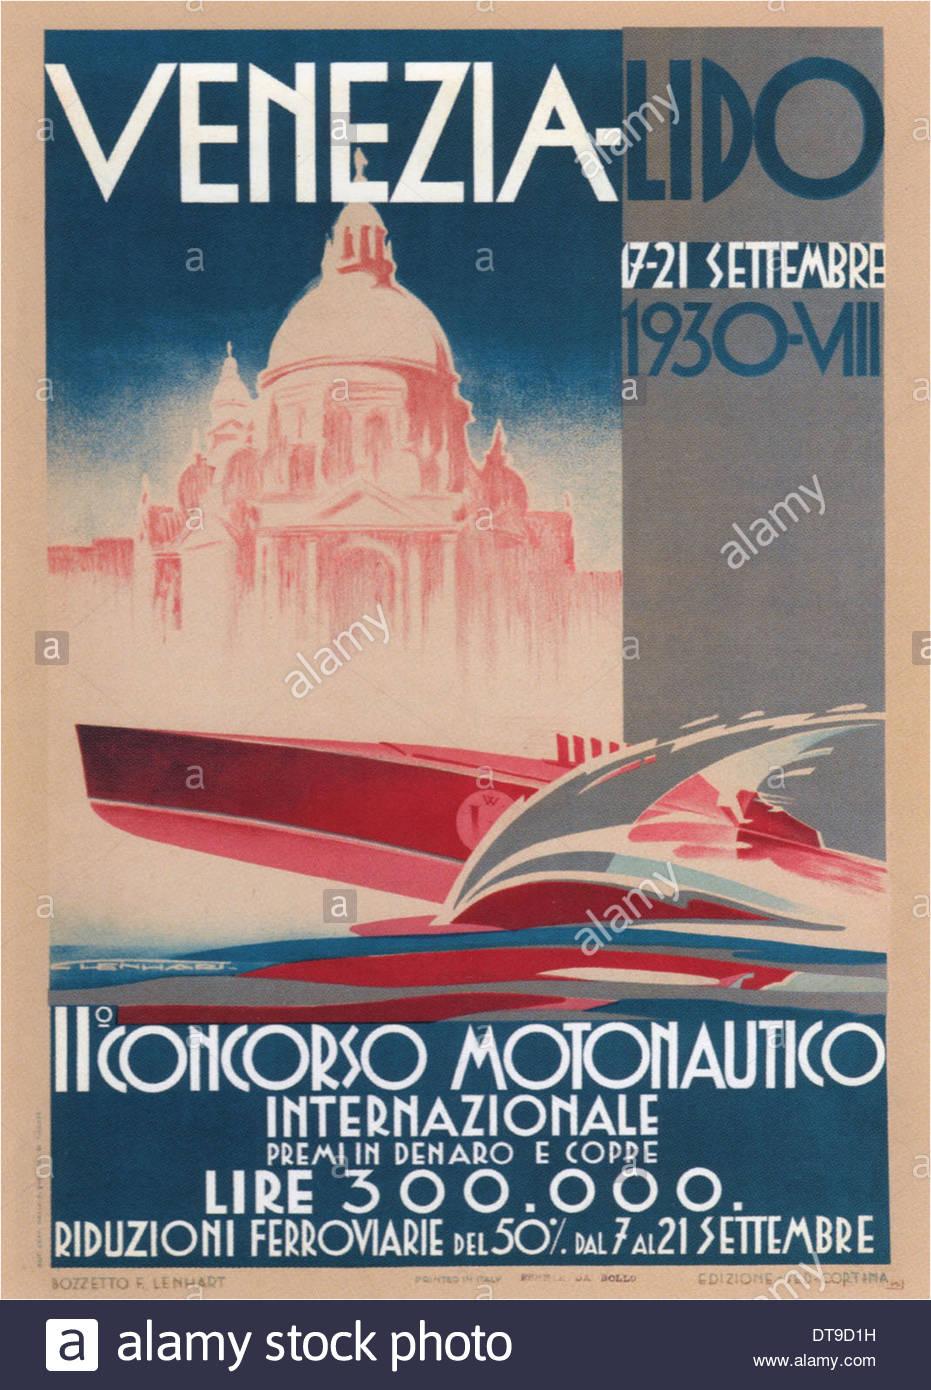 Motorboats International Competition, 1930. Artist: Lenhart, Franz (1898-1992) - Stock Image